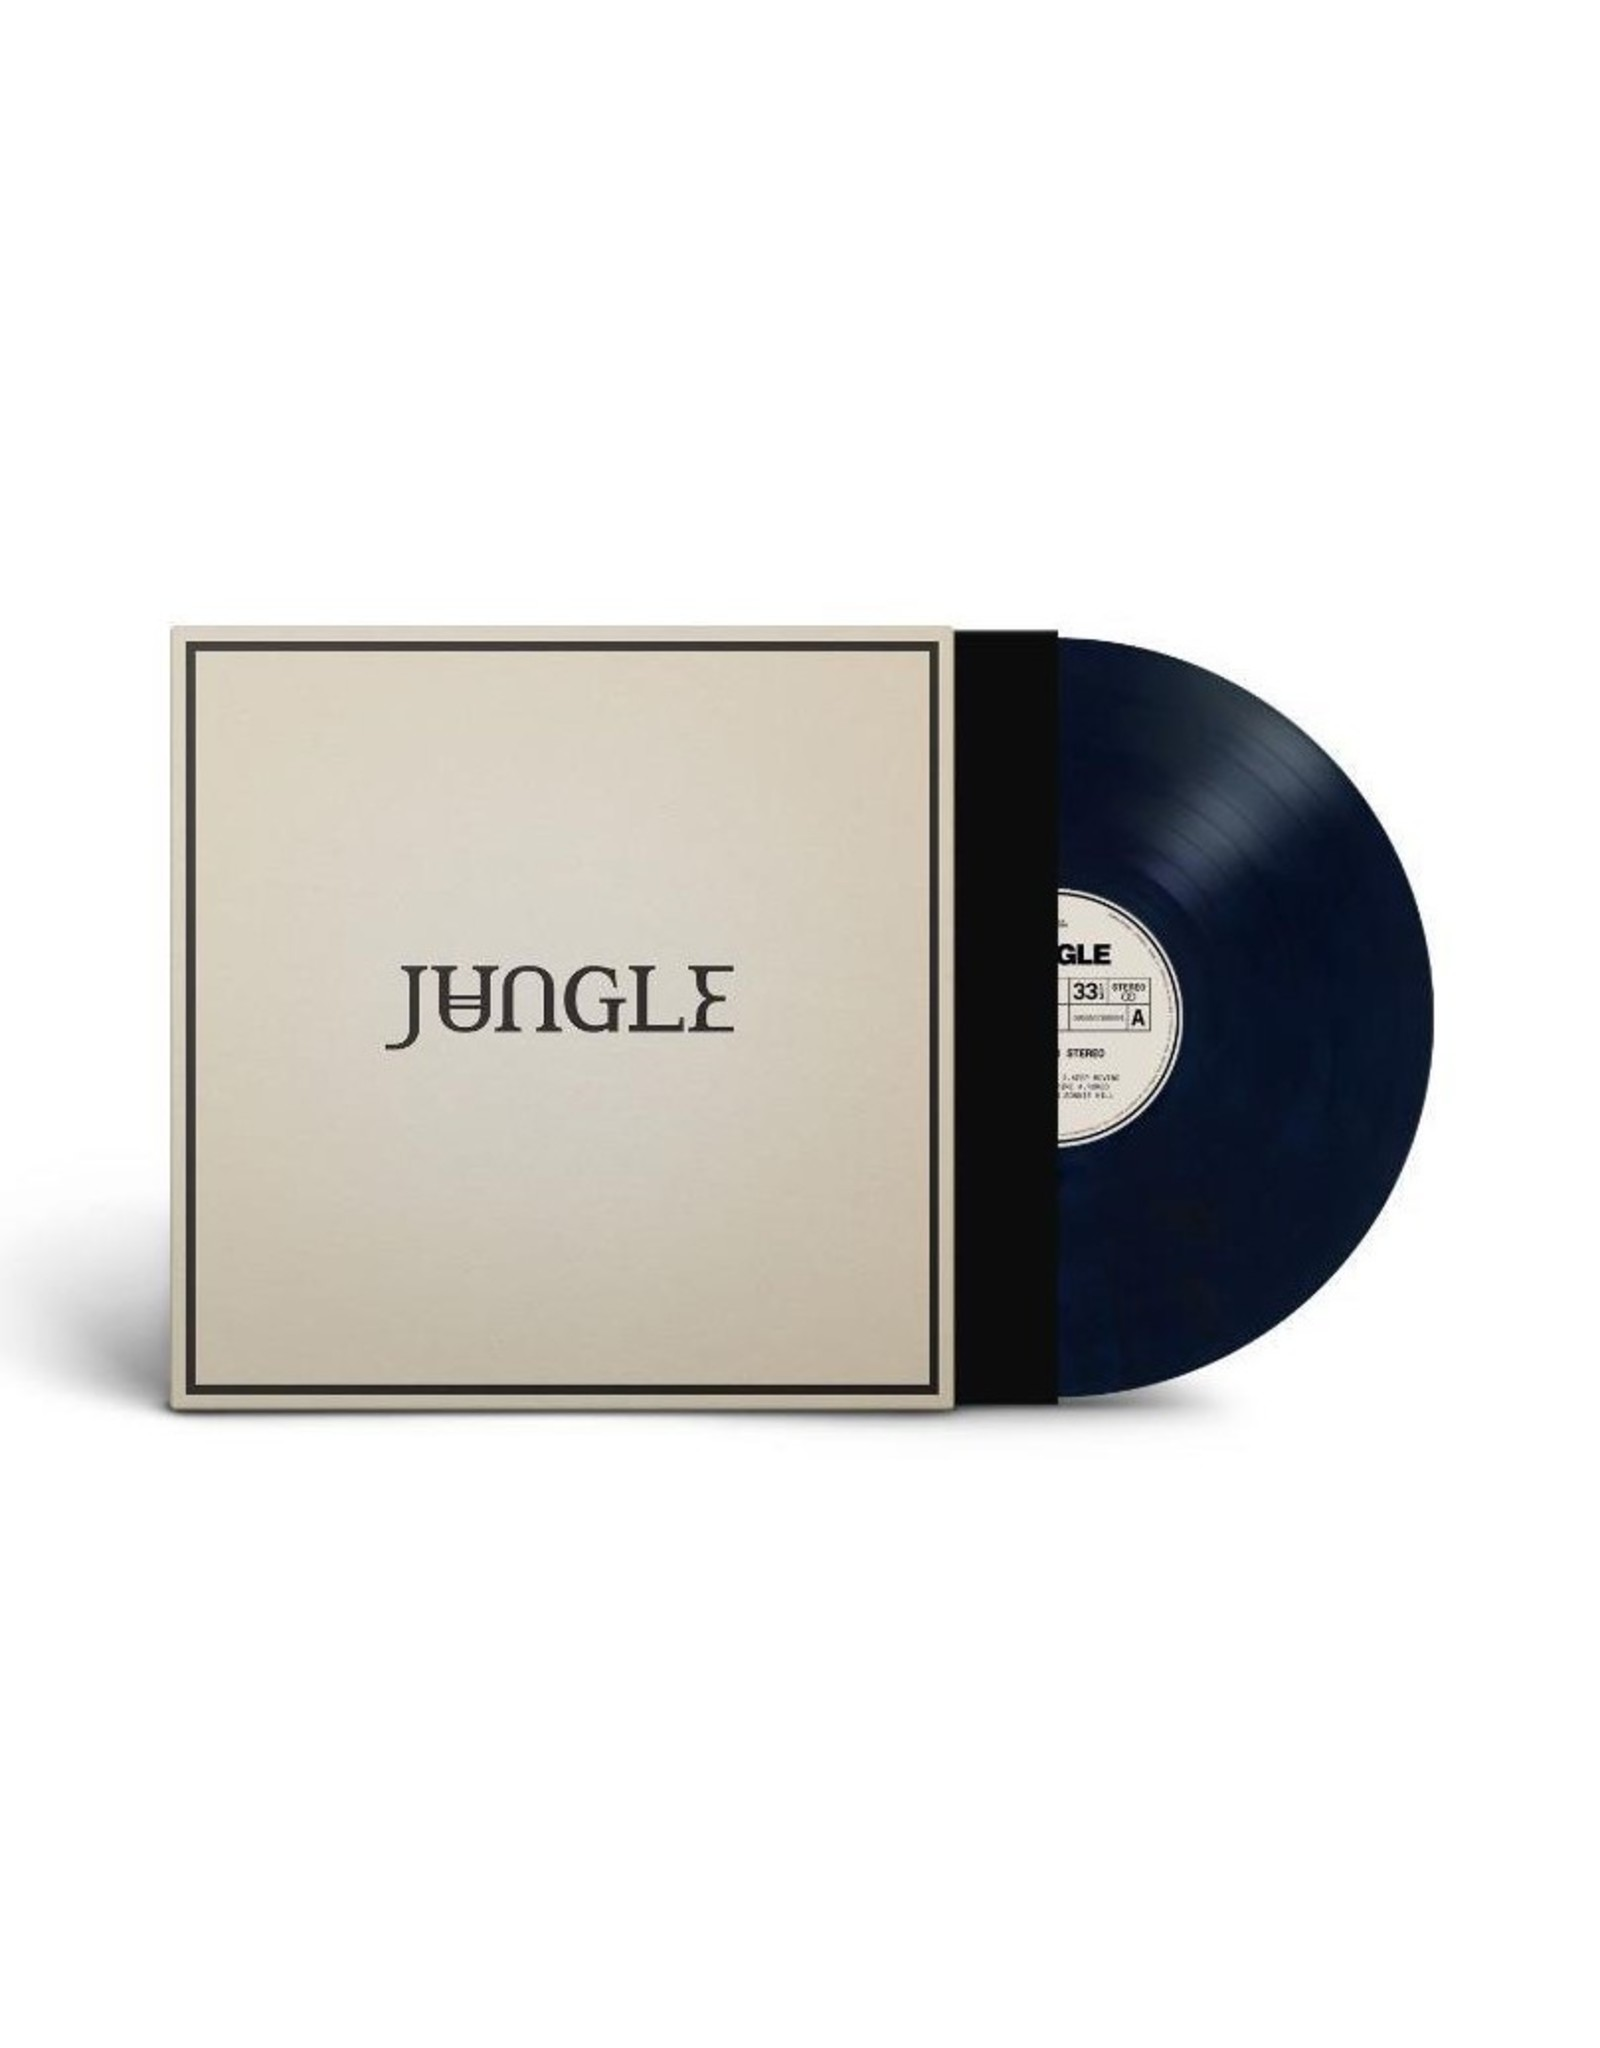 Jungle - Loving In Stereo (Exclusive Dark Blue Marble Vinyl)